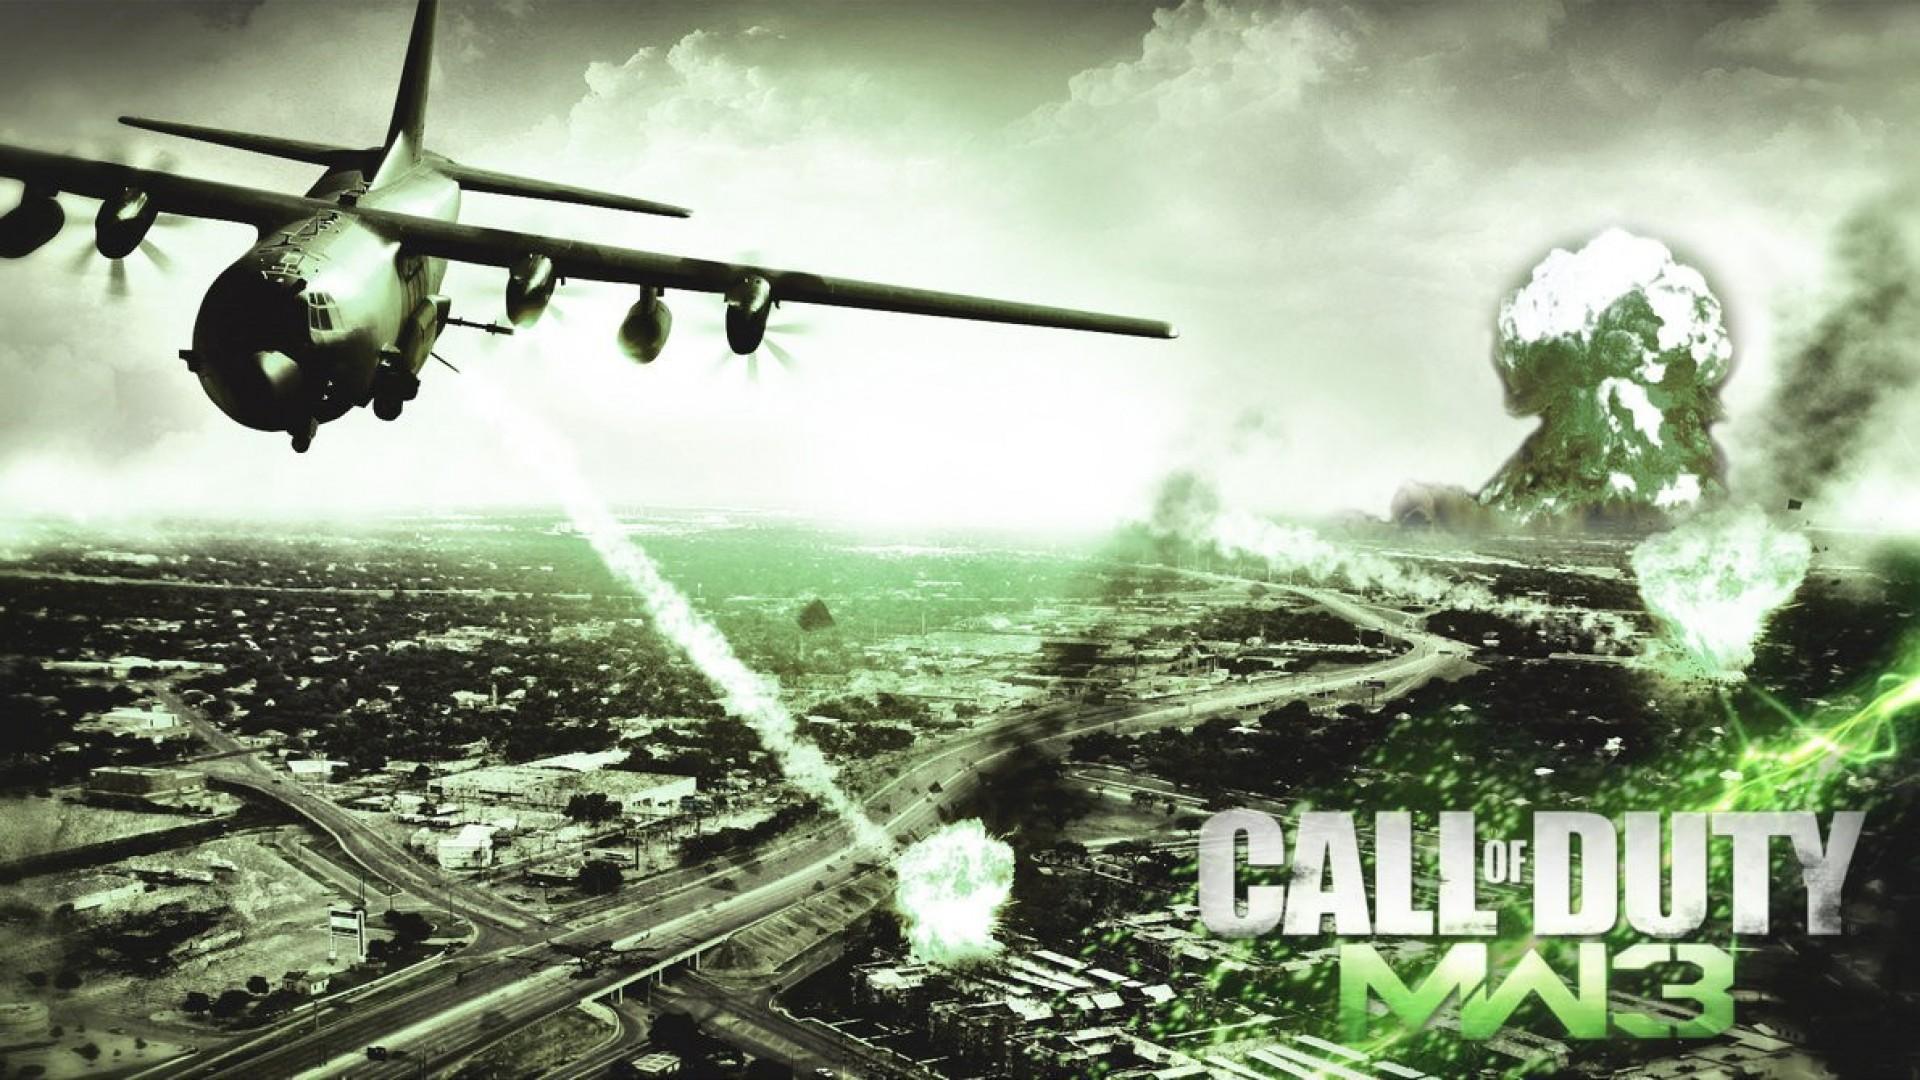 Call Of Duty Modern Warfare 3 Wallpaper 26